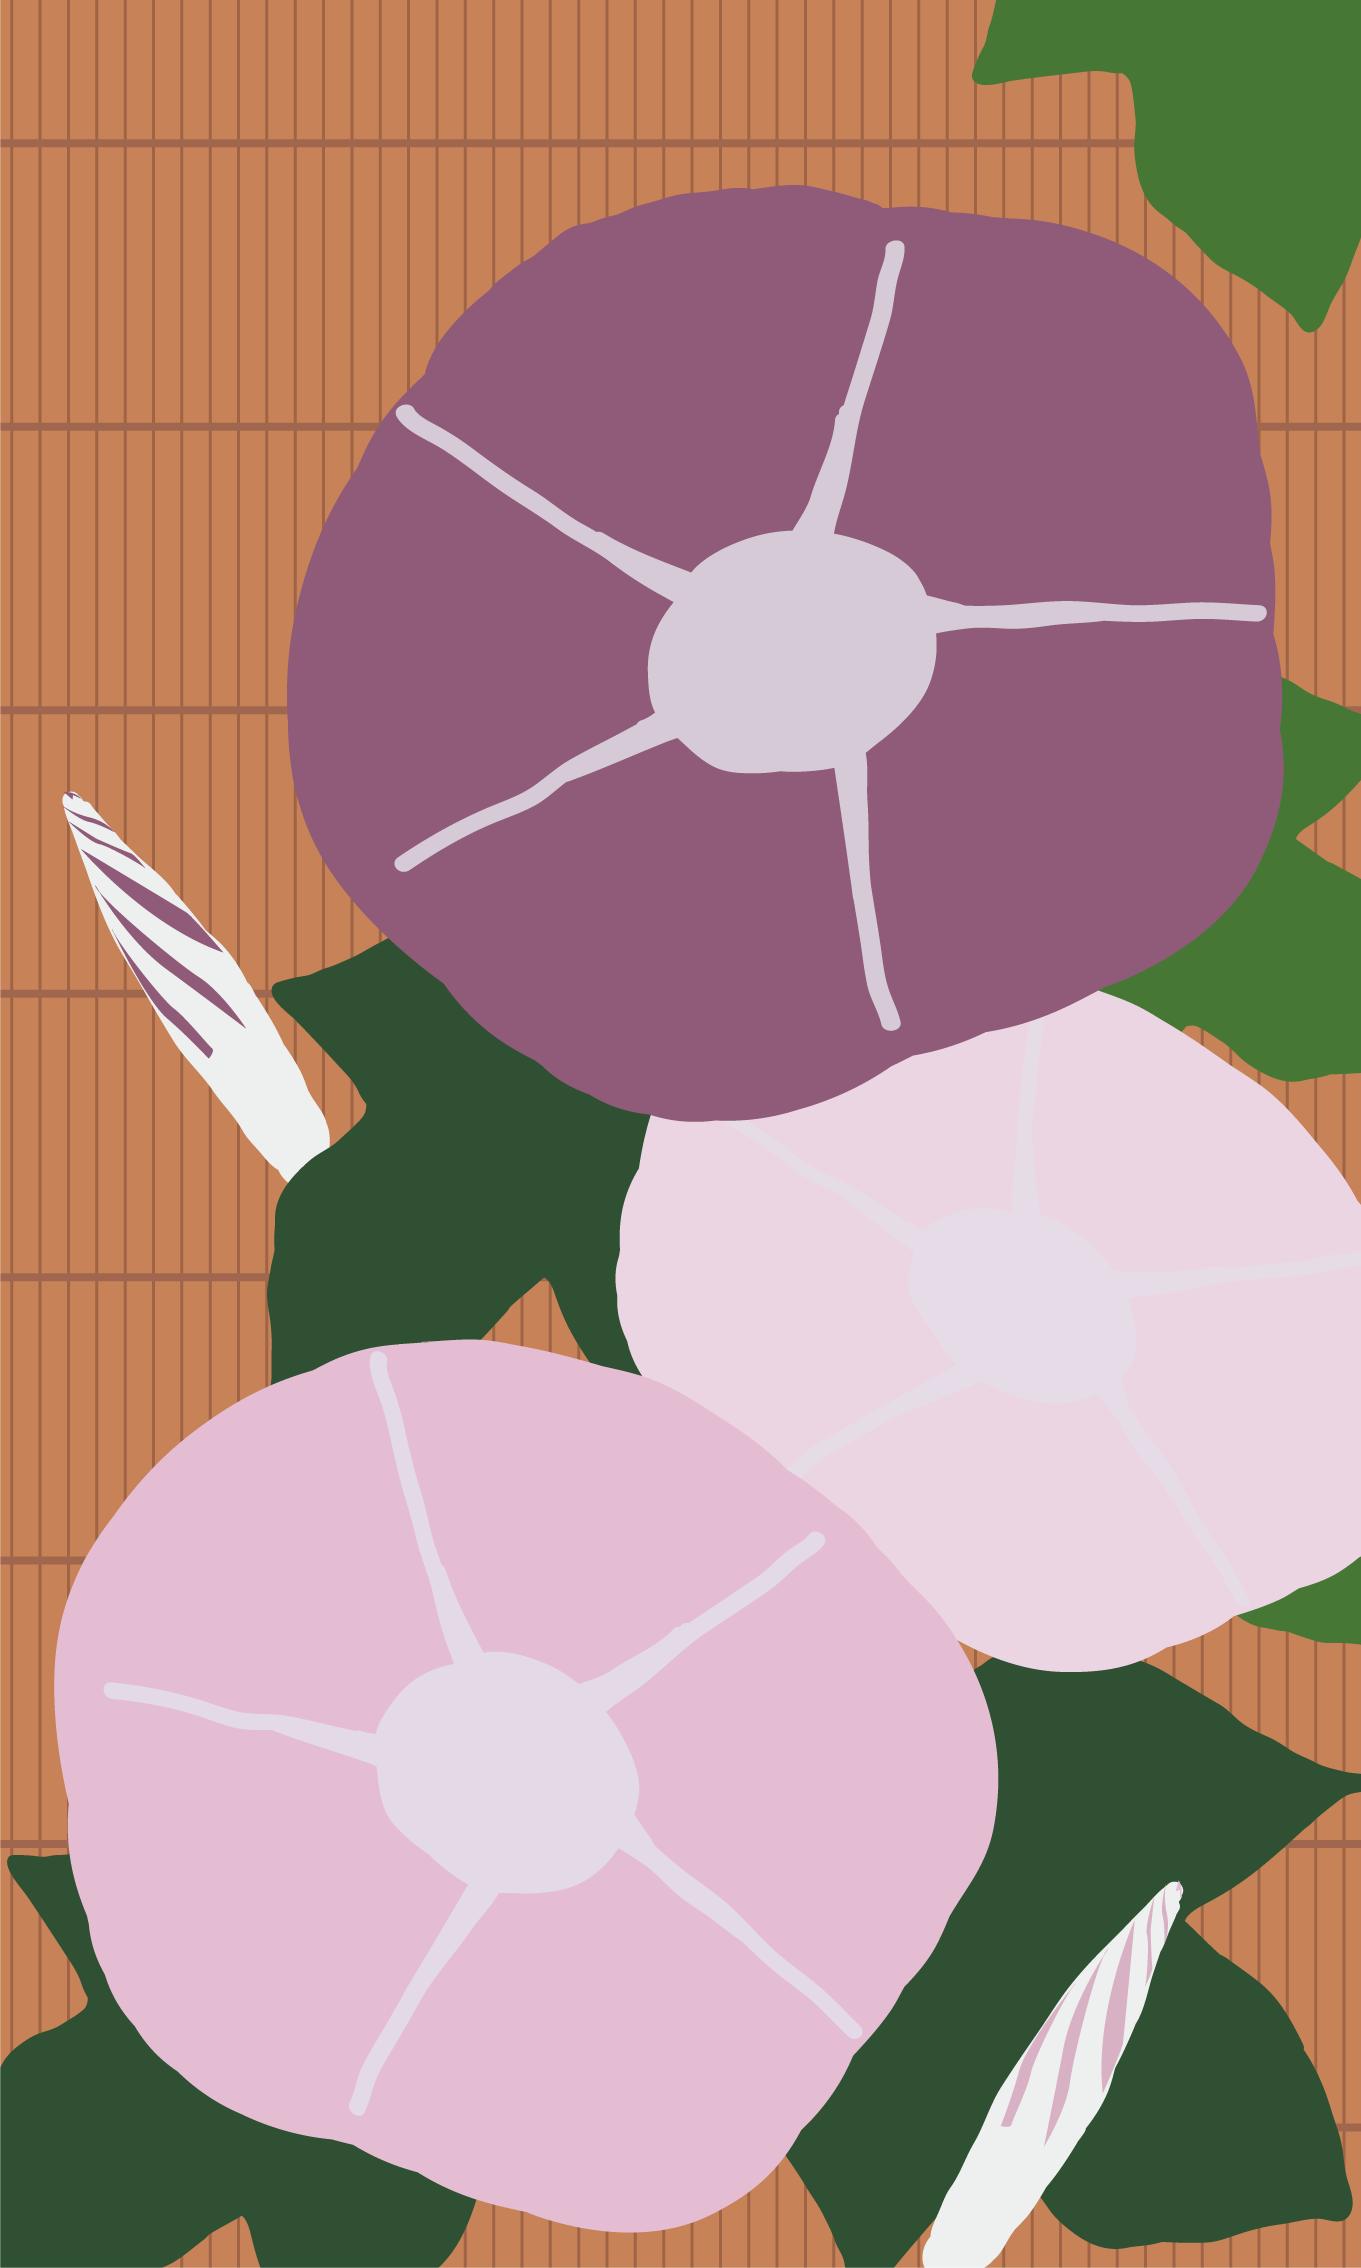 INFOBAR xv用壁紙 | あさがお CHERRY BERRY(480x800)